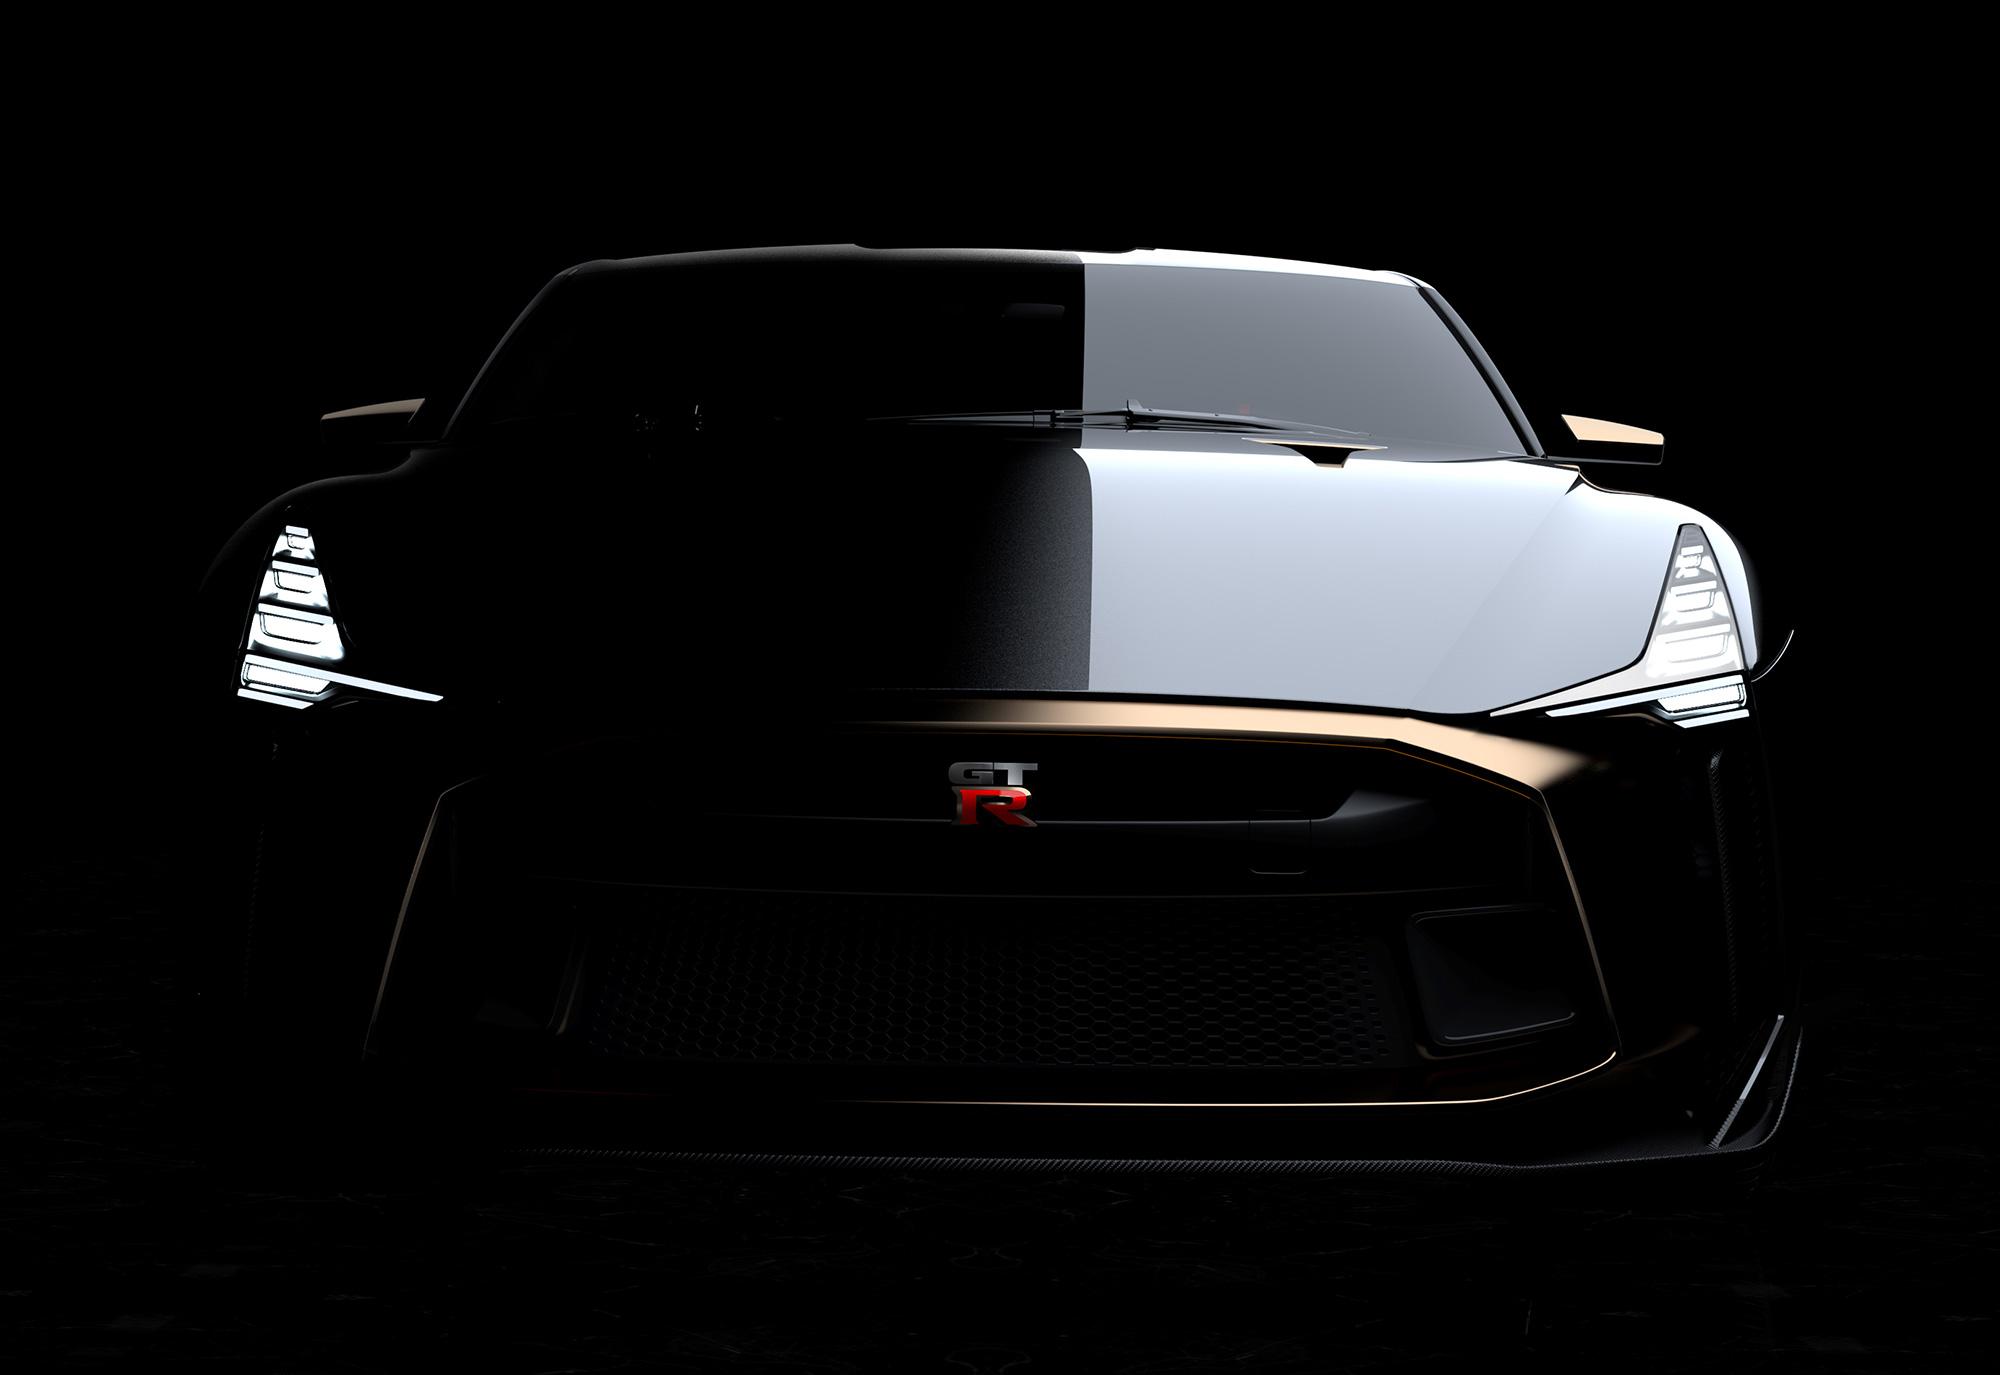 2018-06-25-Nissan-GT-R50-by-Italdesign-EXTERIOR-IMAGE-6.jpg